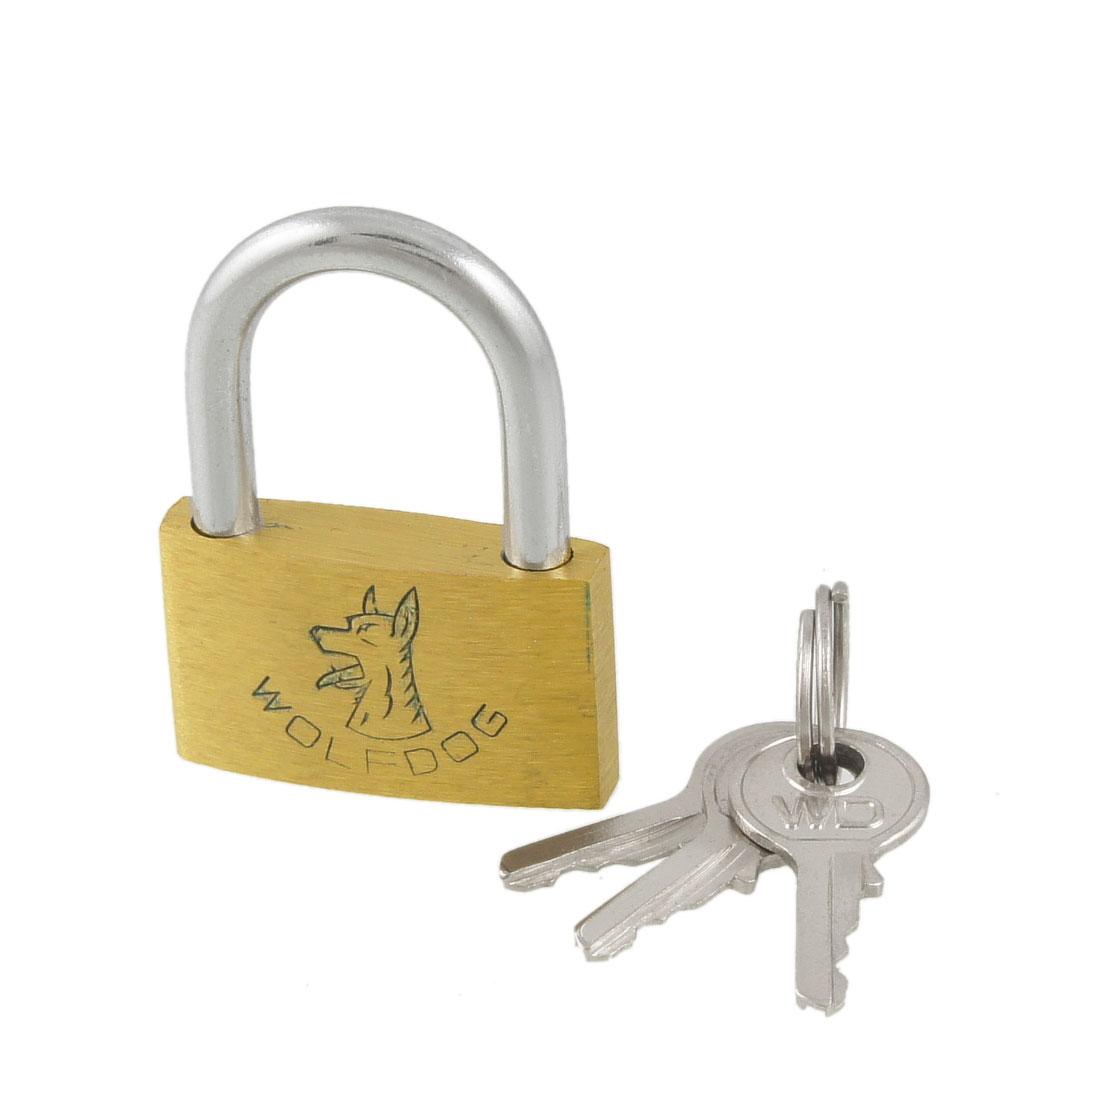 "1.2"" Length Gold Tone Metal Shackle Security Padlock w 3 Keys"